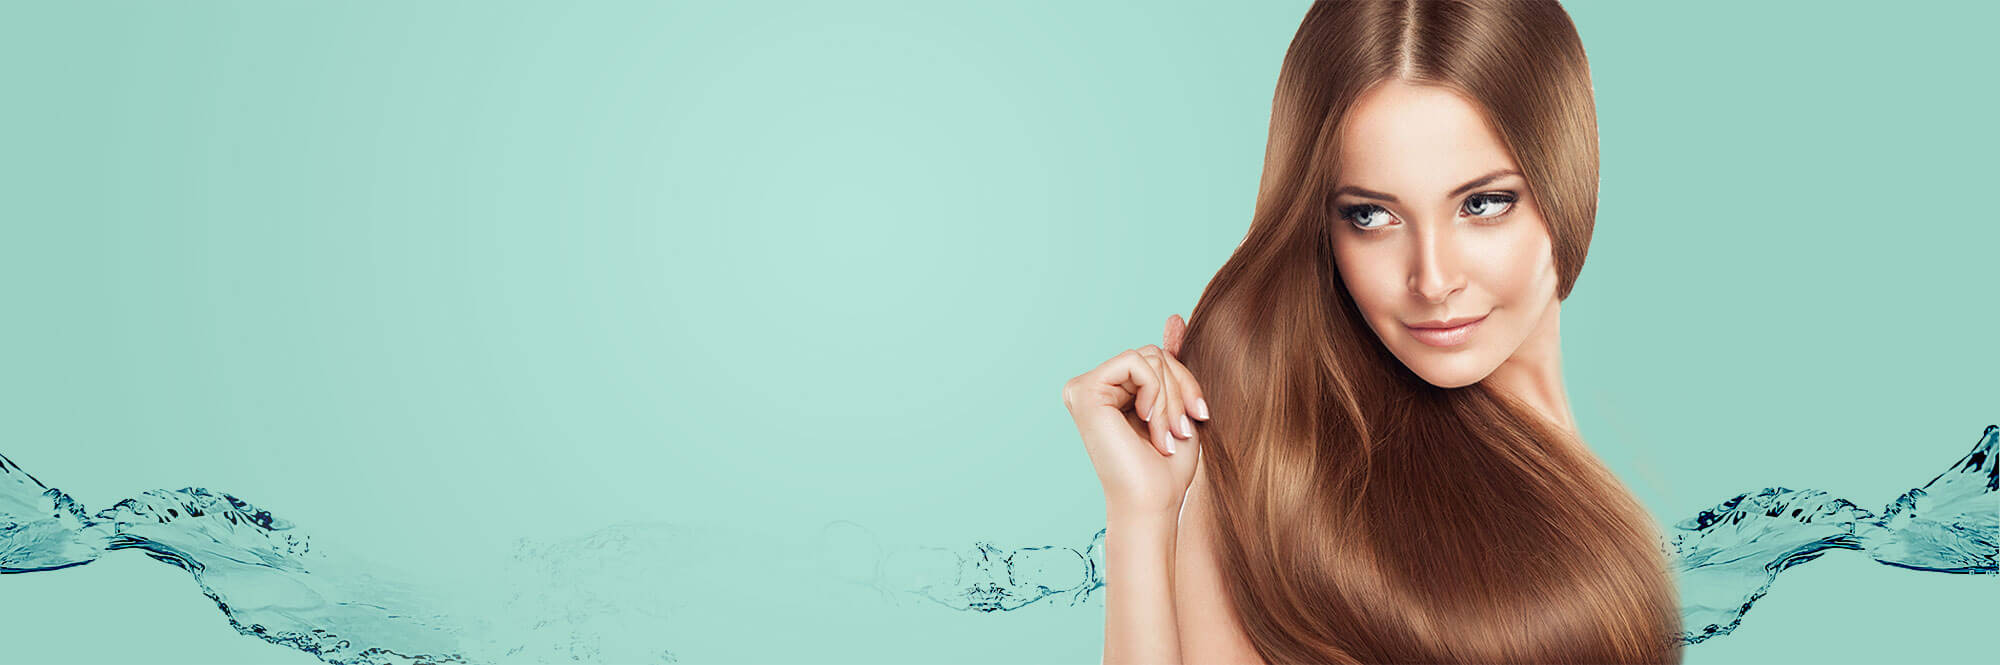 Bliss Hair - ingredientes - funciona - como tomar